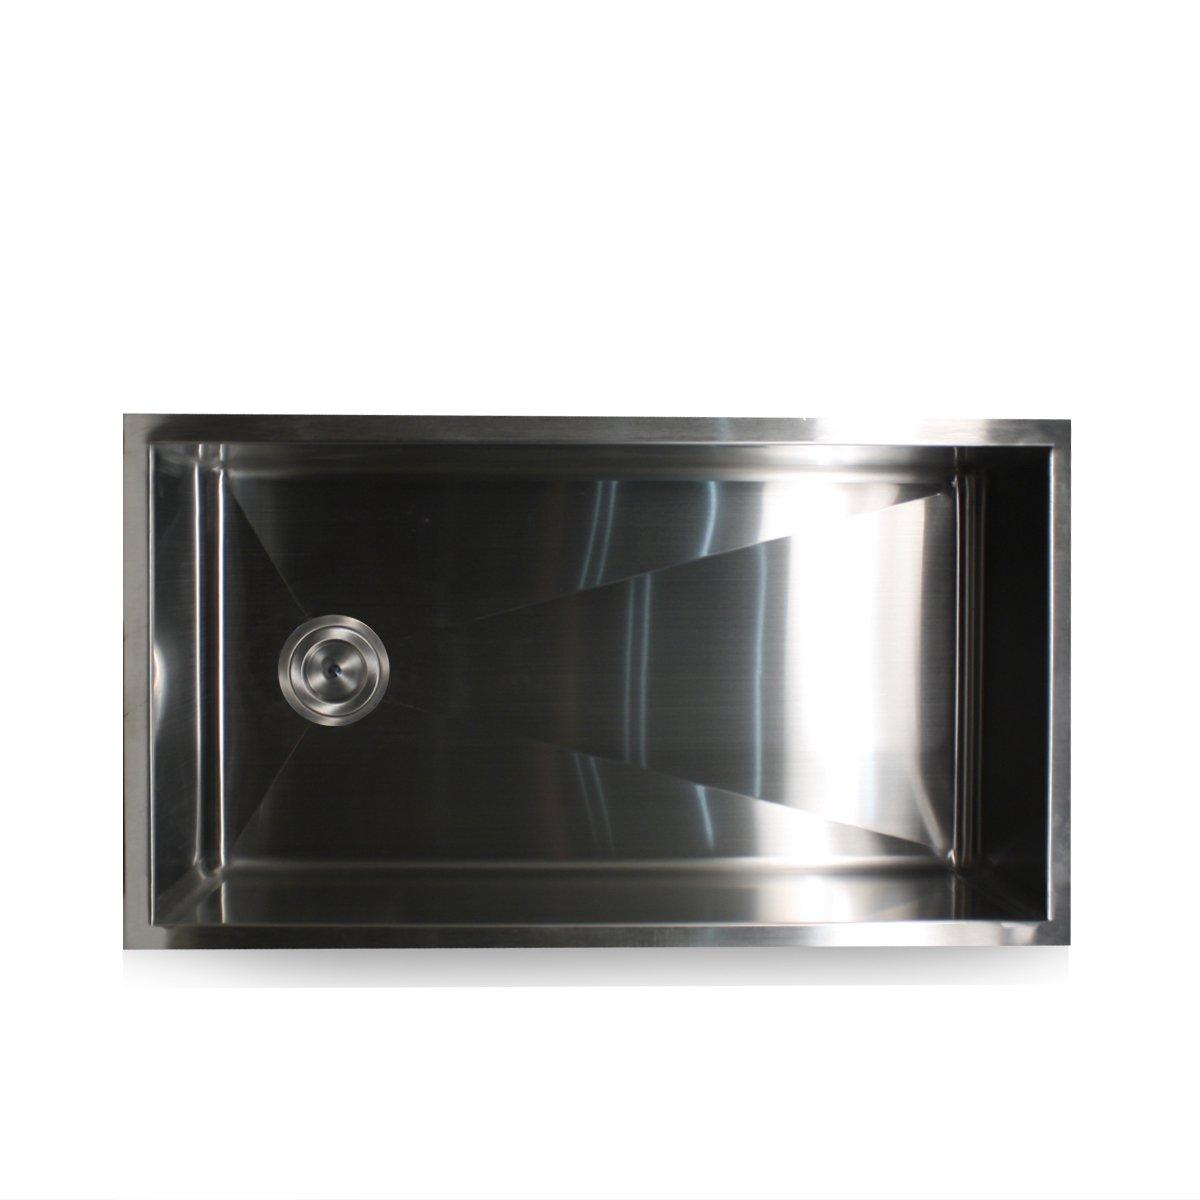 nantucket sinks zr3218 32inch pro series single bowl undermount kitchen sink with offset drain stainless steel amazoncom